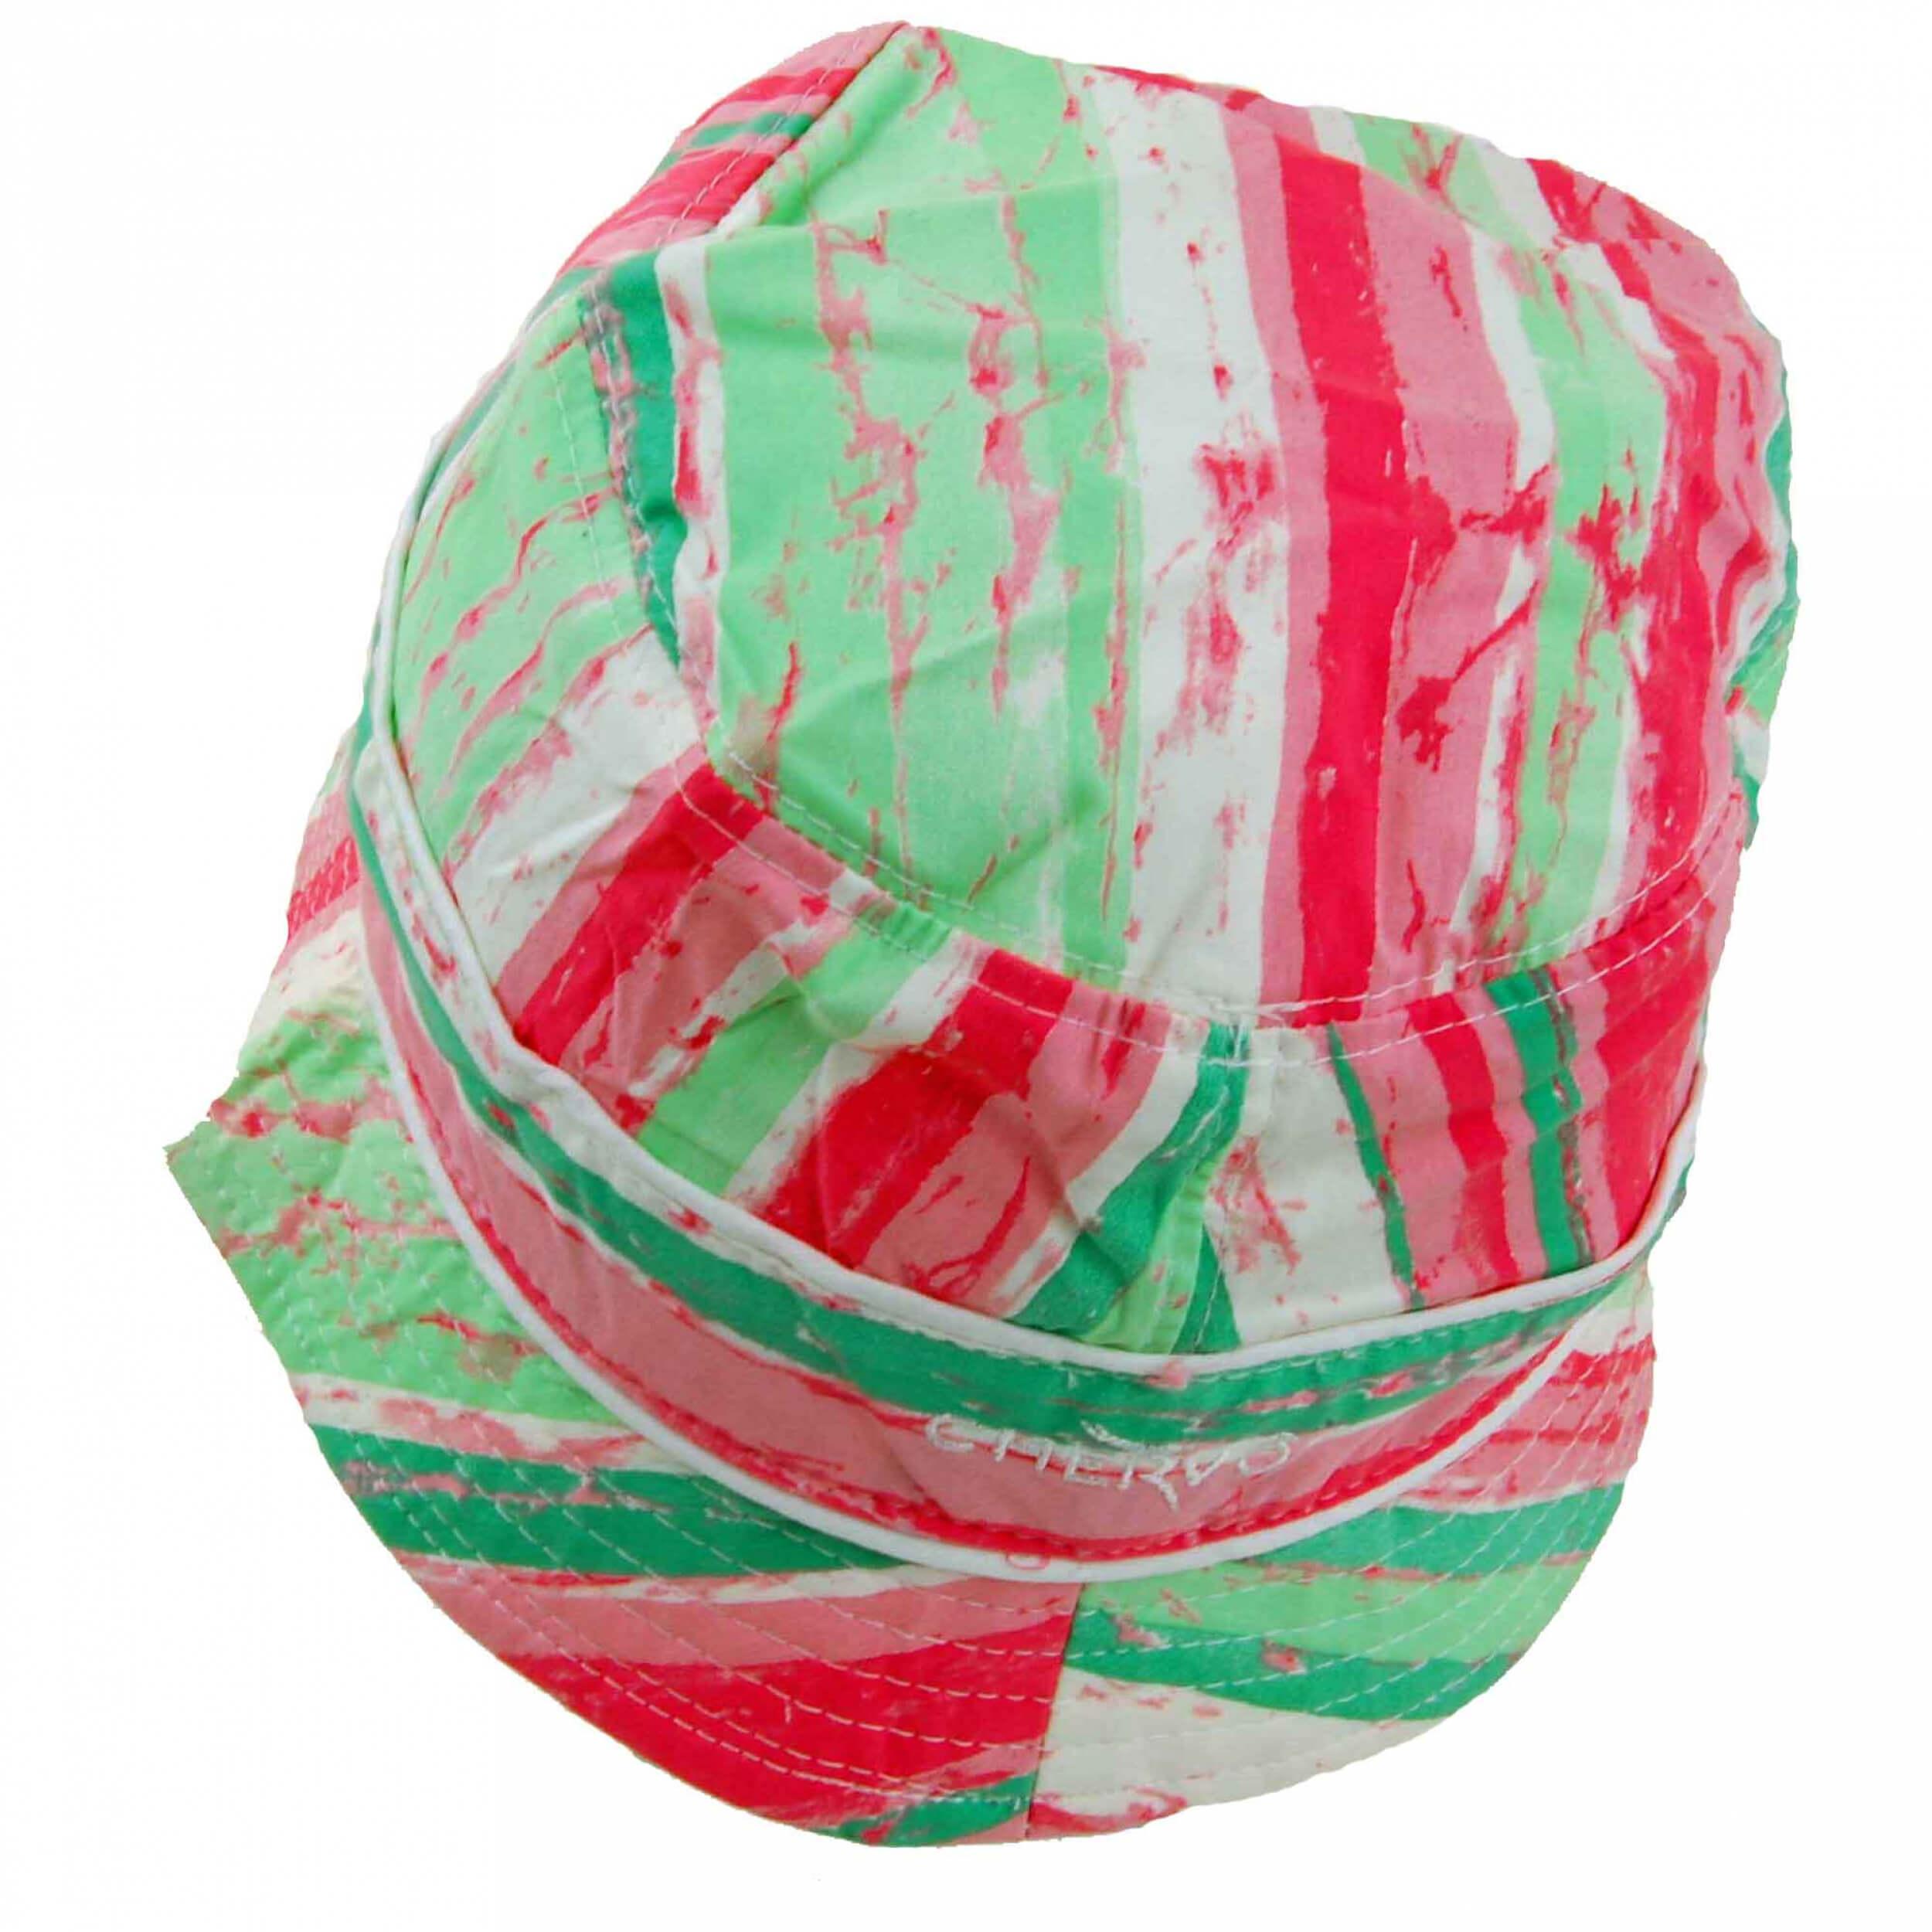 Chervo Sonnenhut Wecchioni DRY MATIC 90G pink grün gemustert